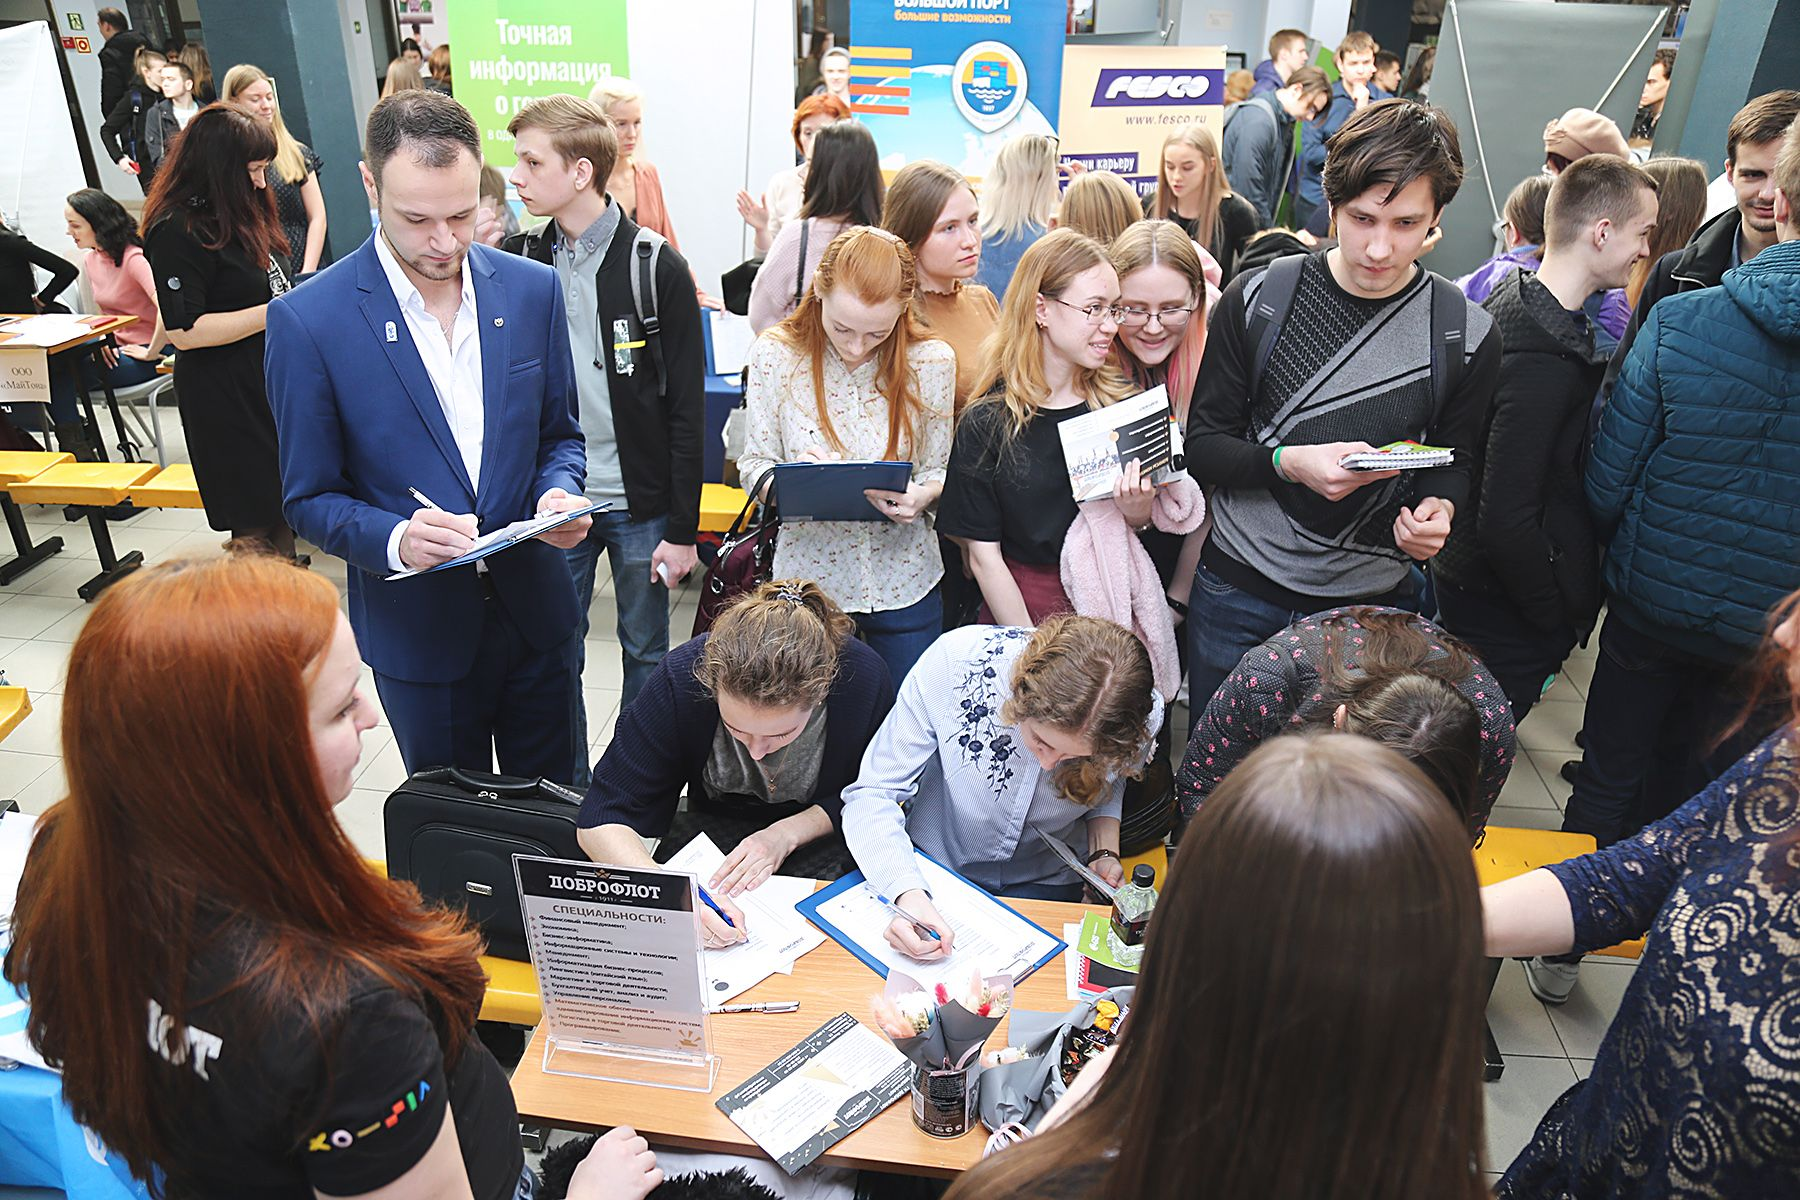 Цифровая ярмарка вакансий ВГУЭС на онлайн-платформе «Факультетус»: студентам – работу, компаниям – перспективных сотрудников